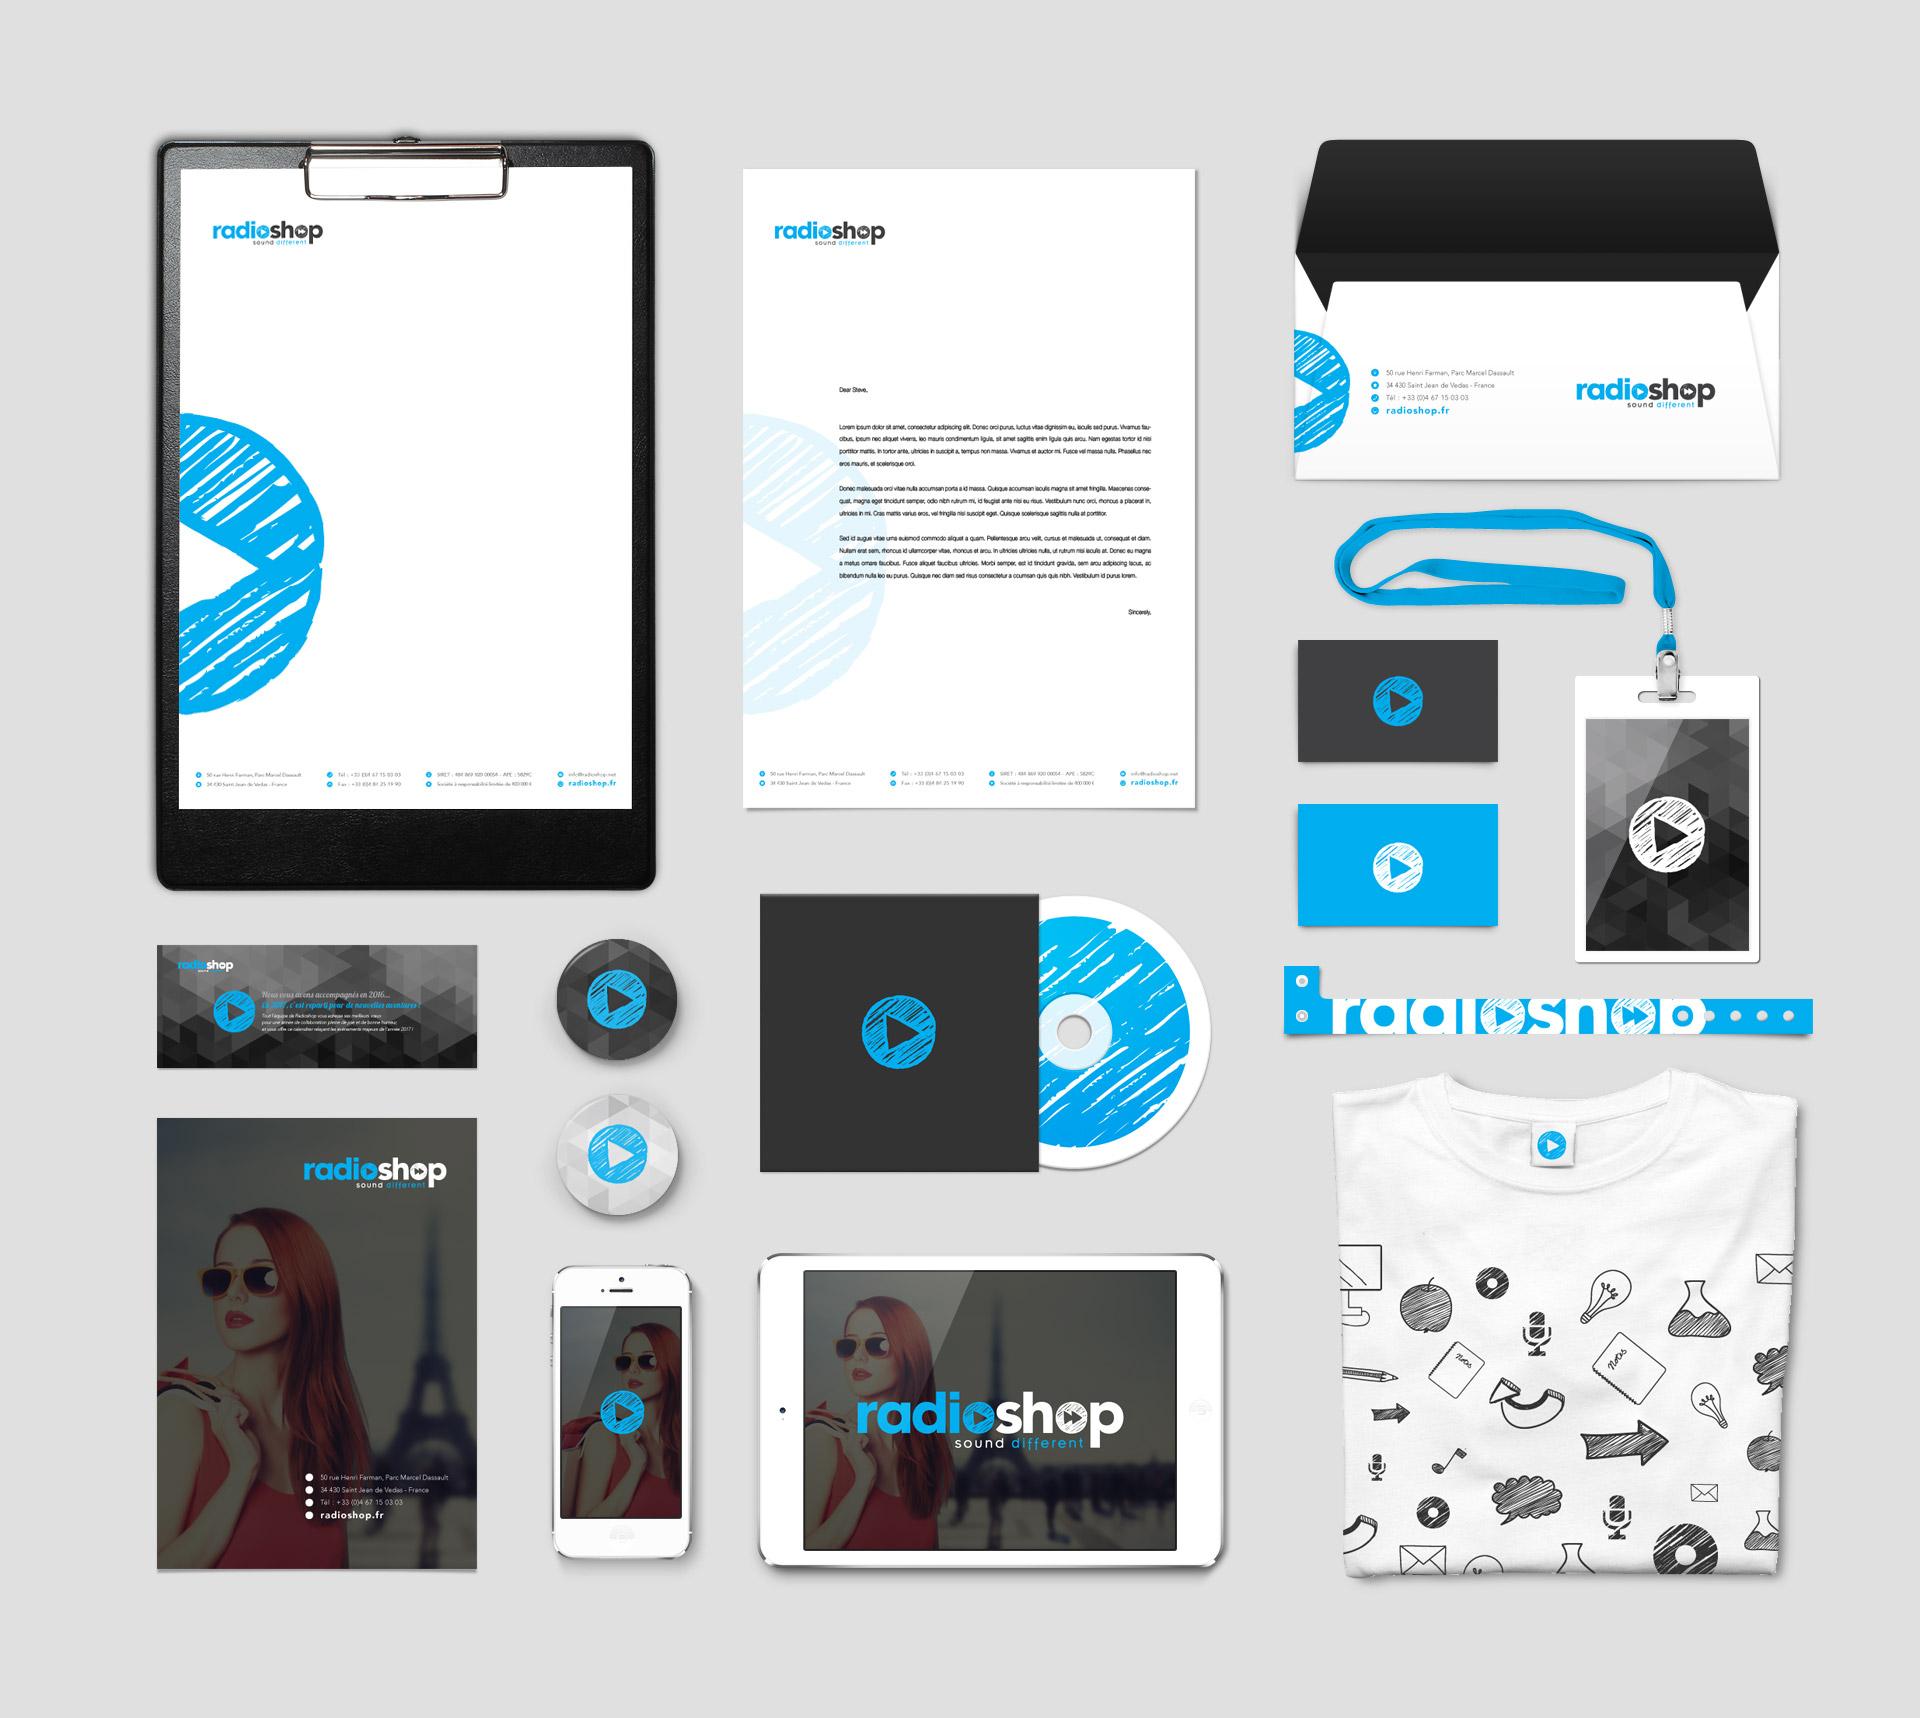 radioshop-creation-papeterie-branding-identite-visuelle-graphiste-montpellier-alexis-cretin